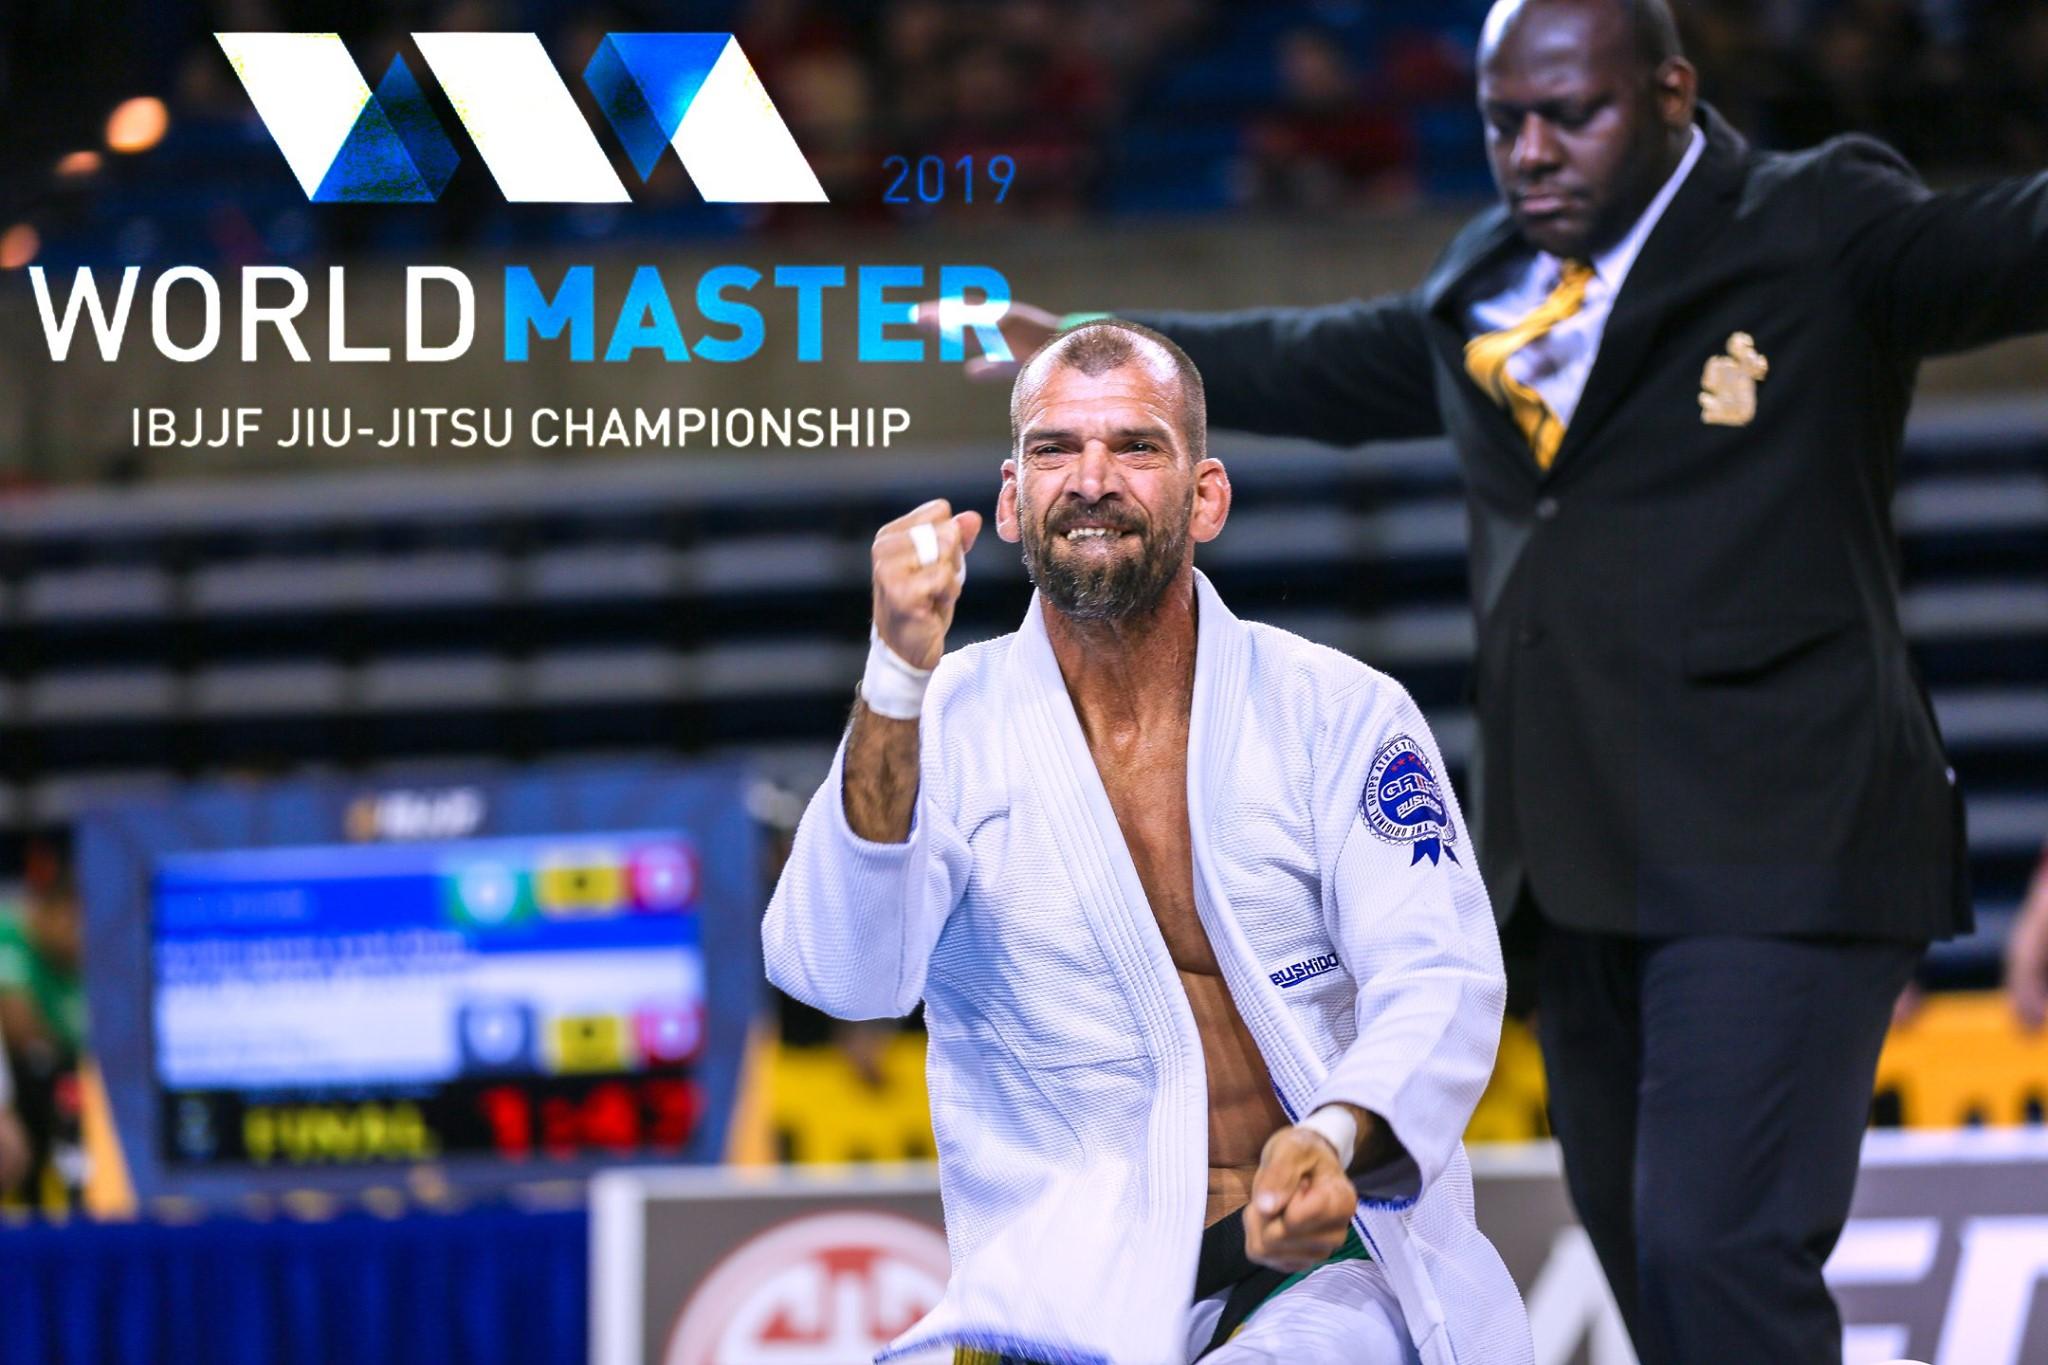 World Master IBJJF Jiu-Jitsu Championship 2019